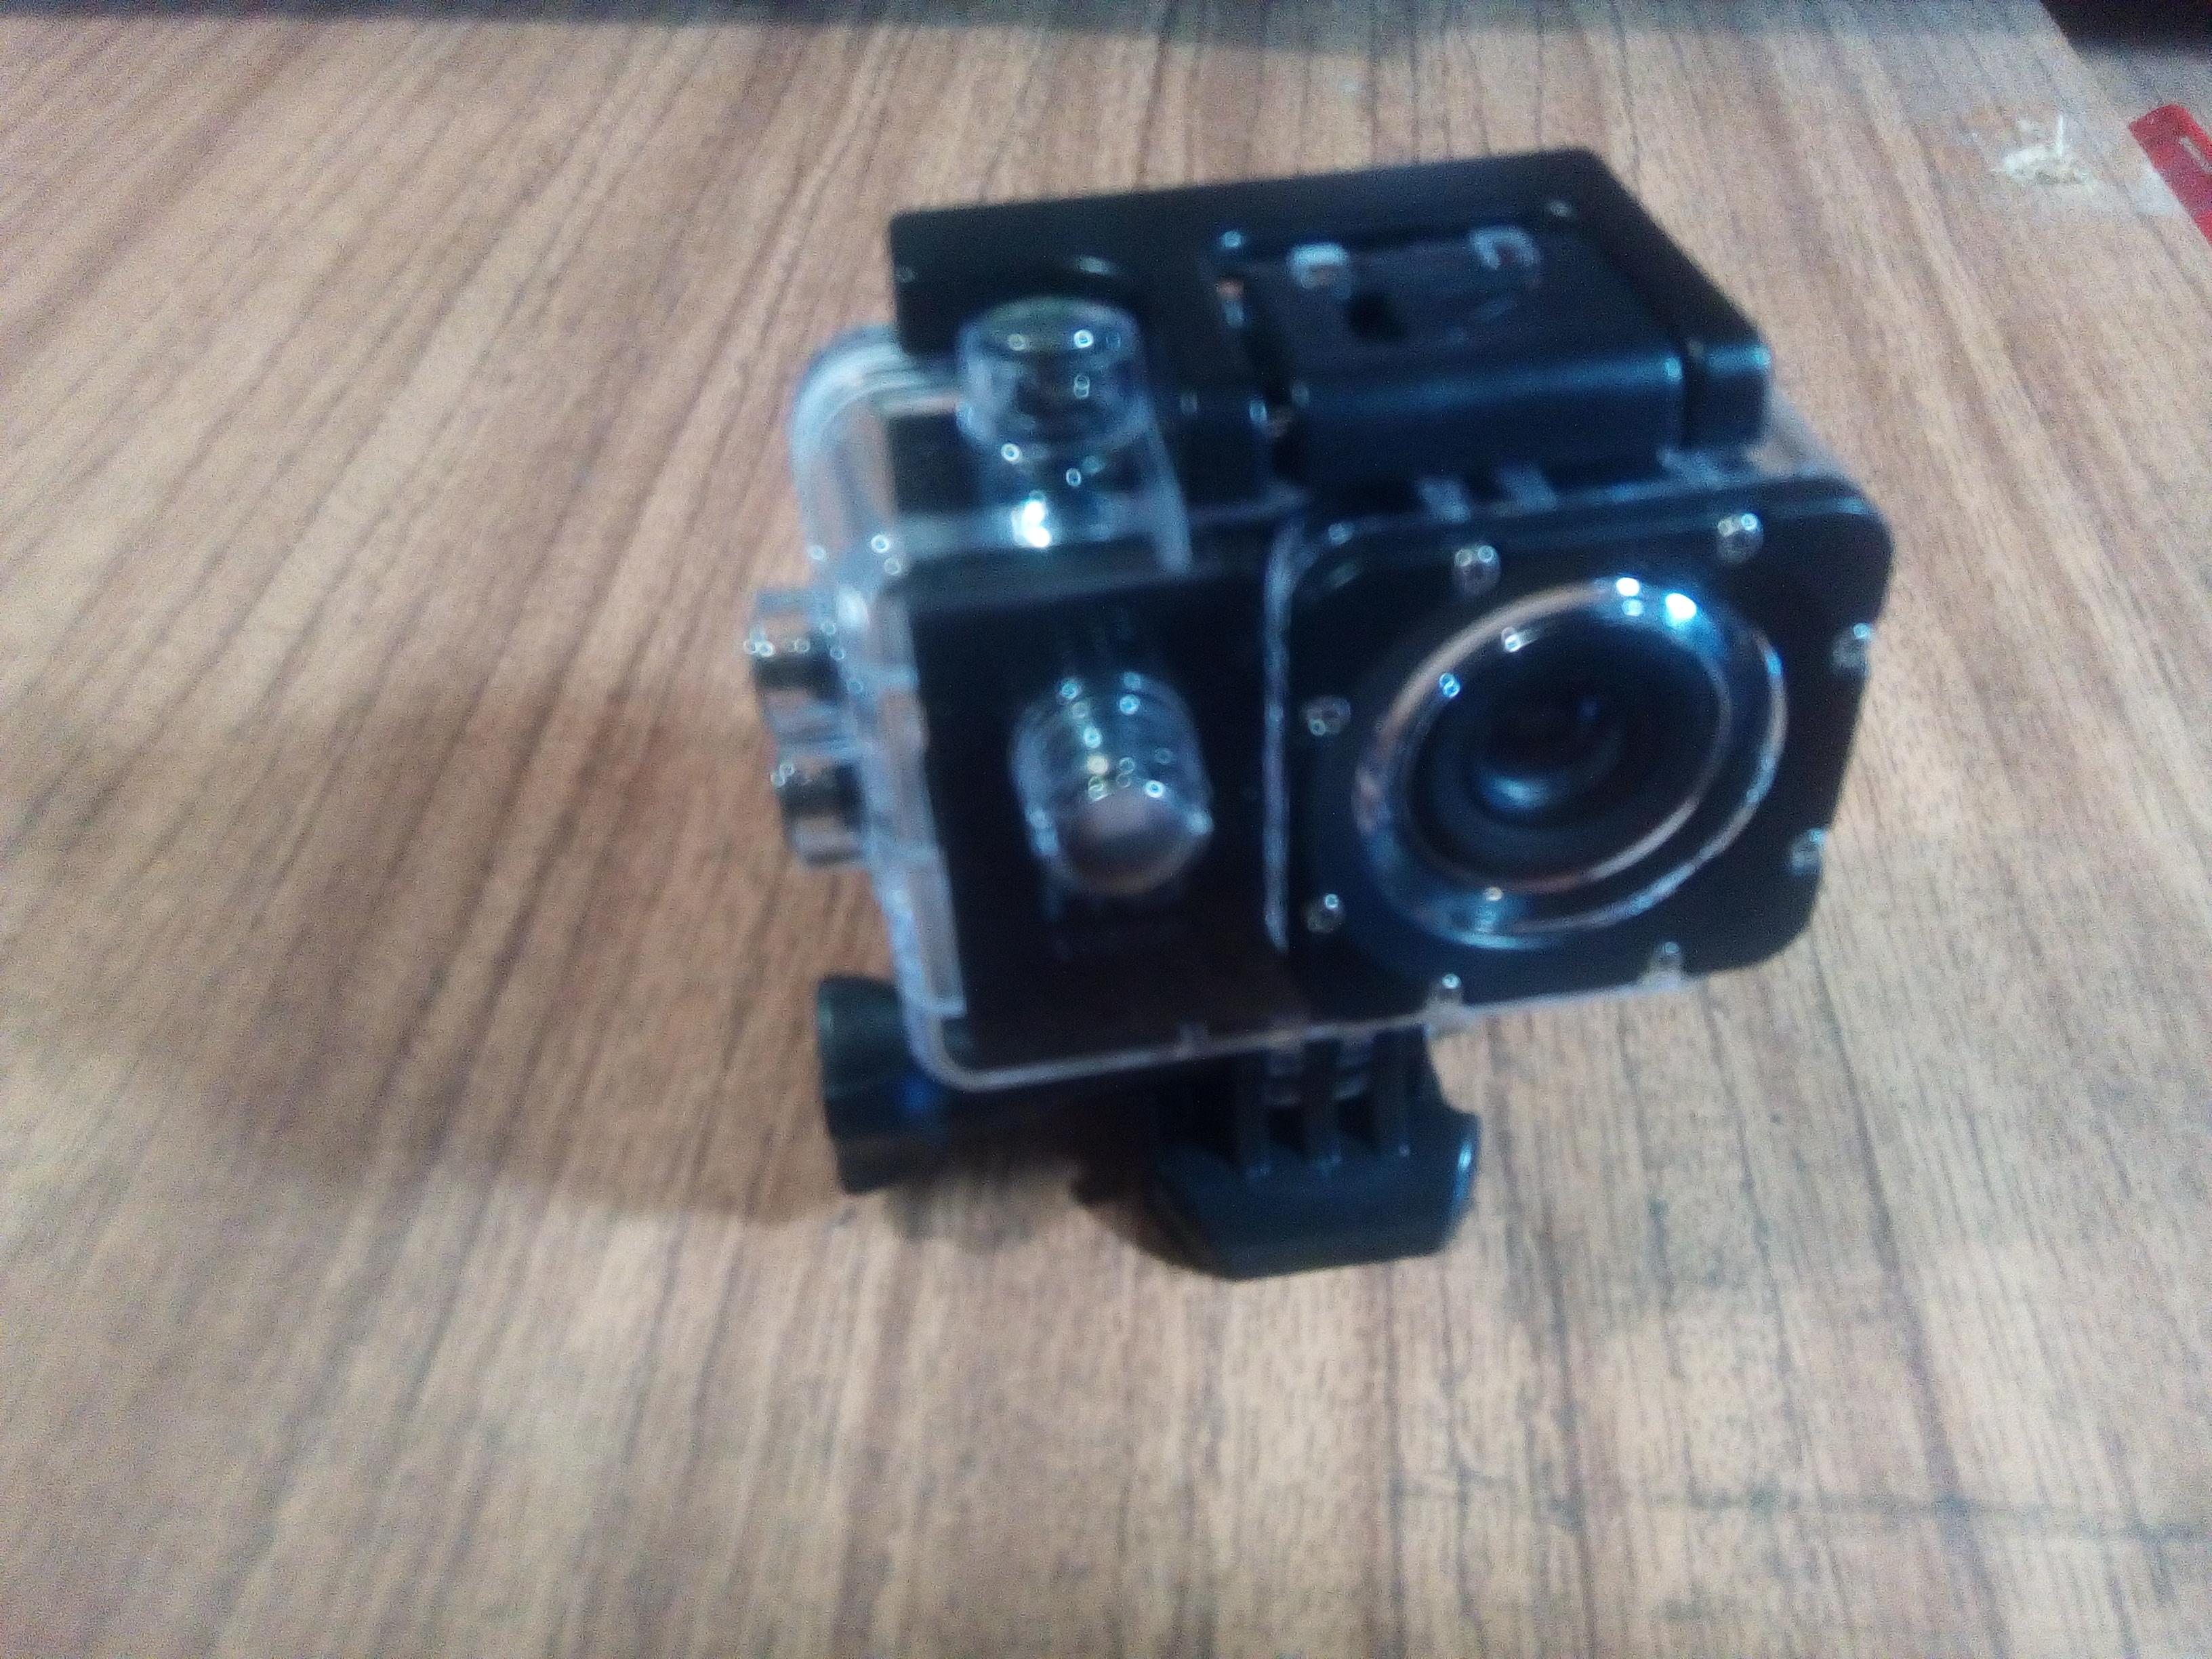 Фото Екшн-камера 1080p Sports Cam. Ремонт кнопки переключения режимов. Время исполнения 1 час.